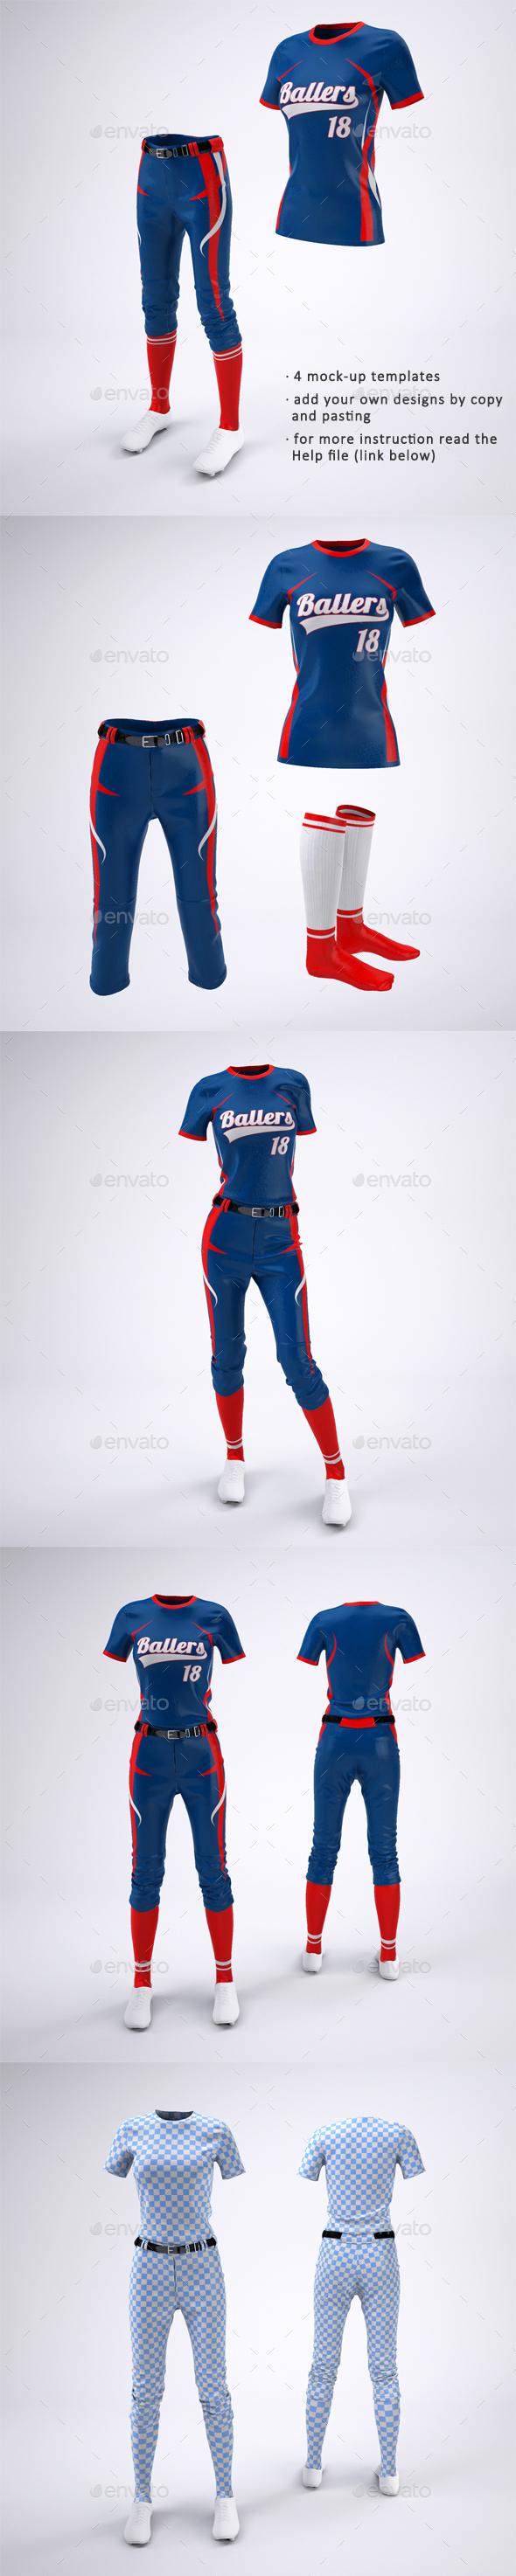 Women's Softball Jerseys and Uniform Mock-Up - Apparel Product Mock-Ups